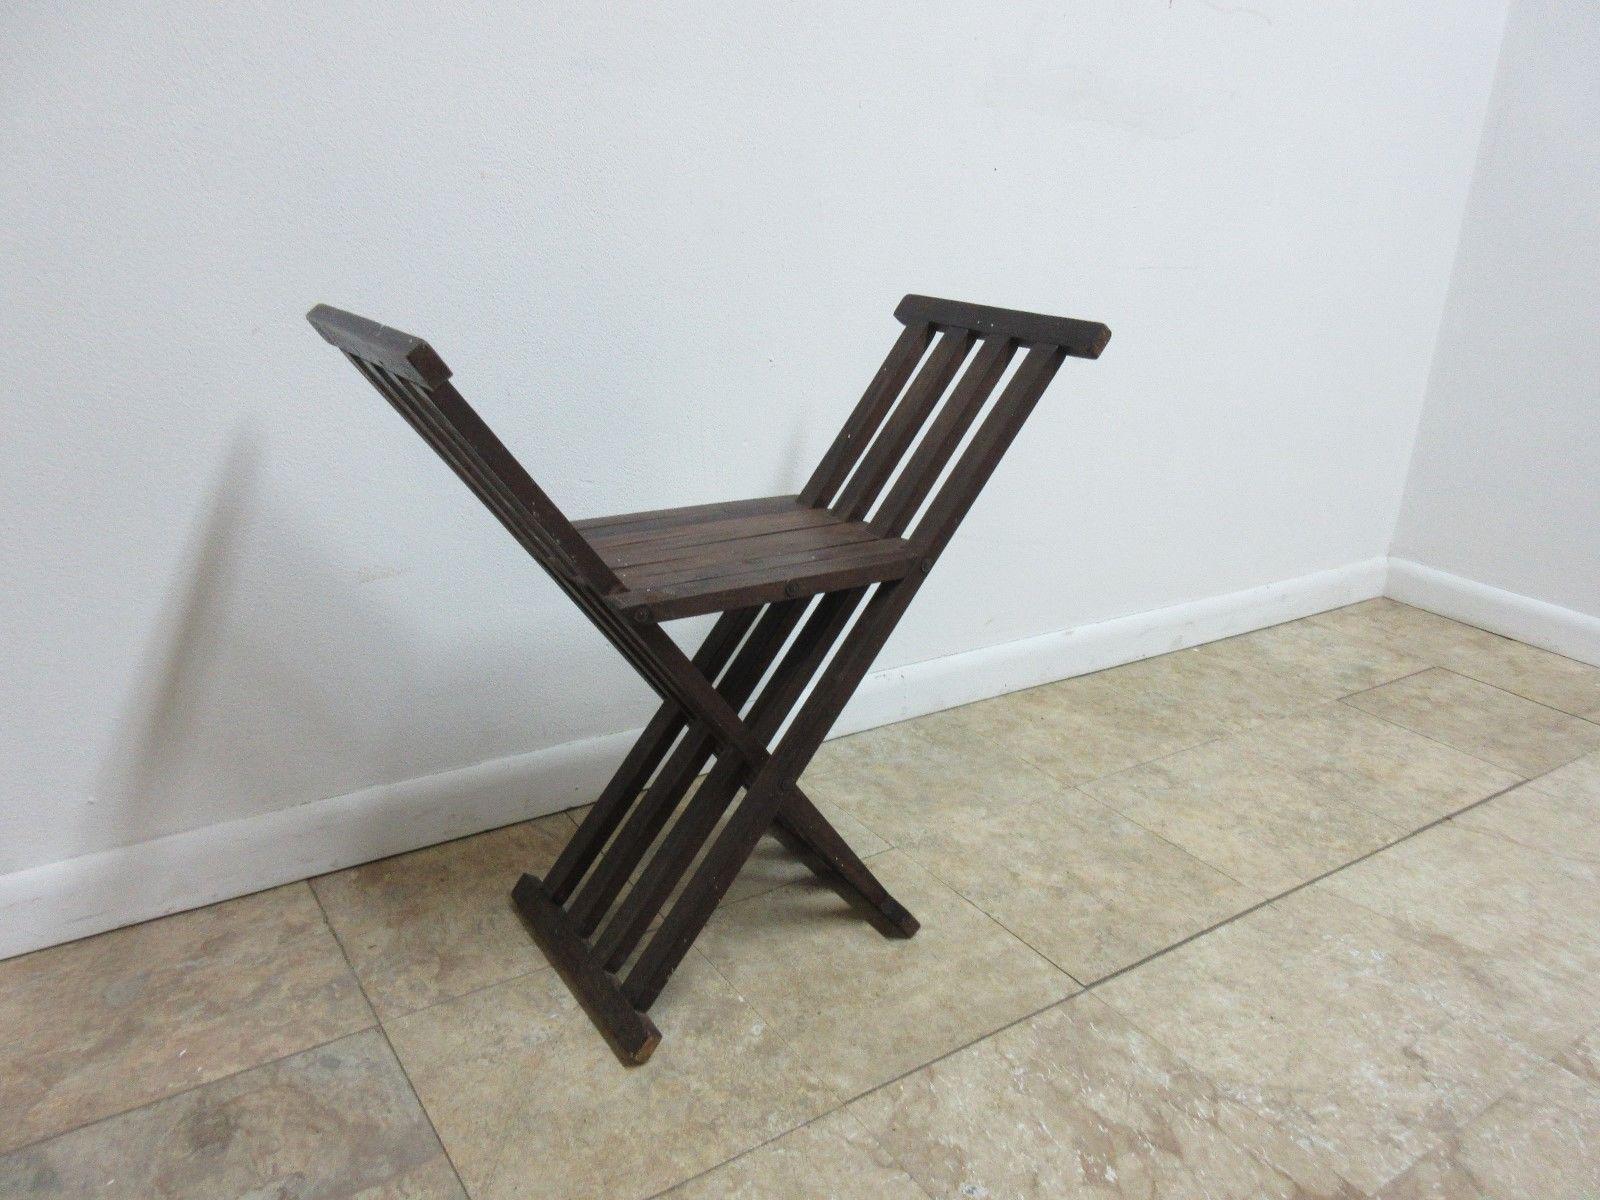 Vintage Campaign X Base Folding Desk Chair Stool End Table